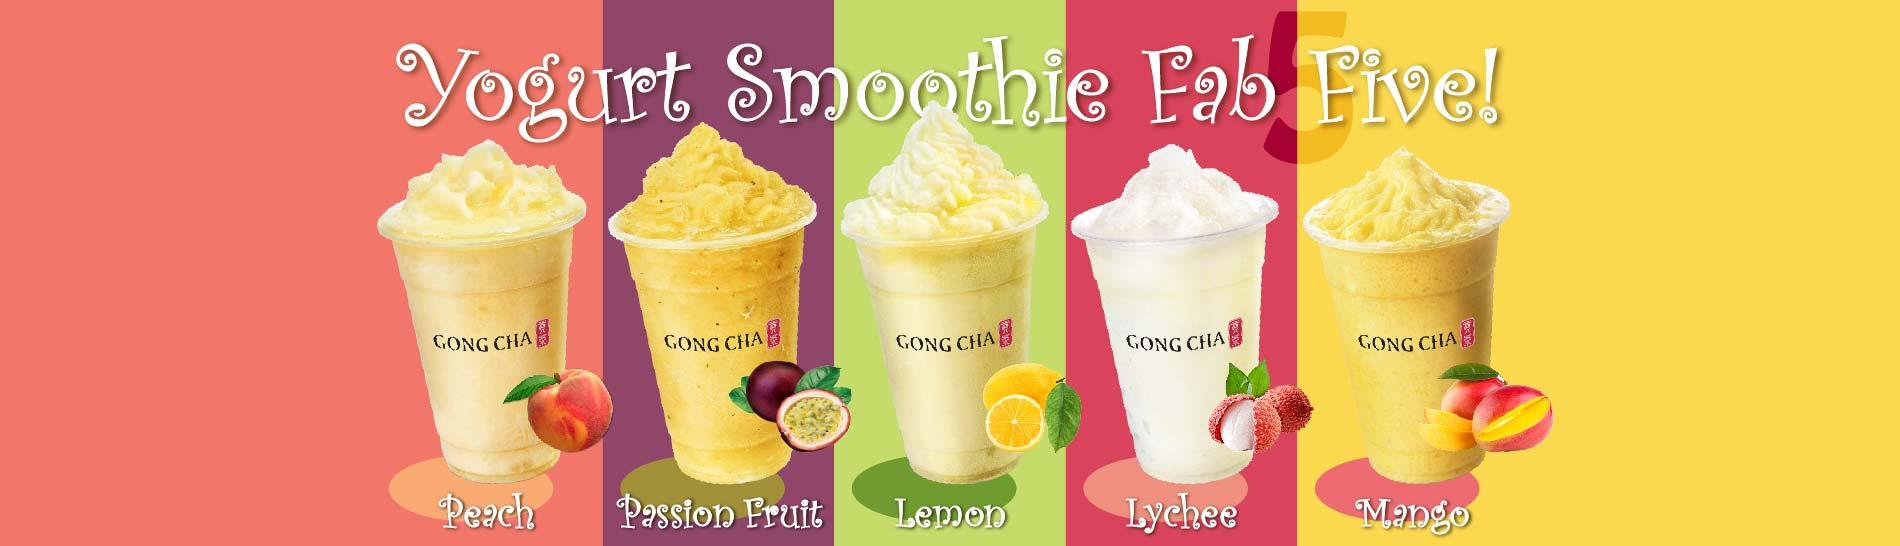 Yogurt Smoothie Series